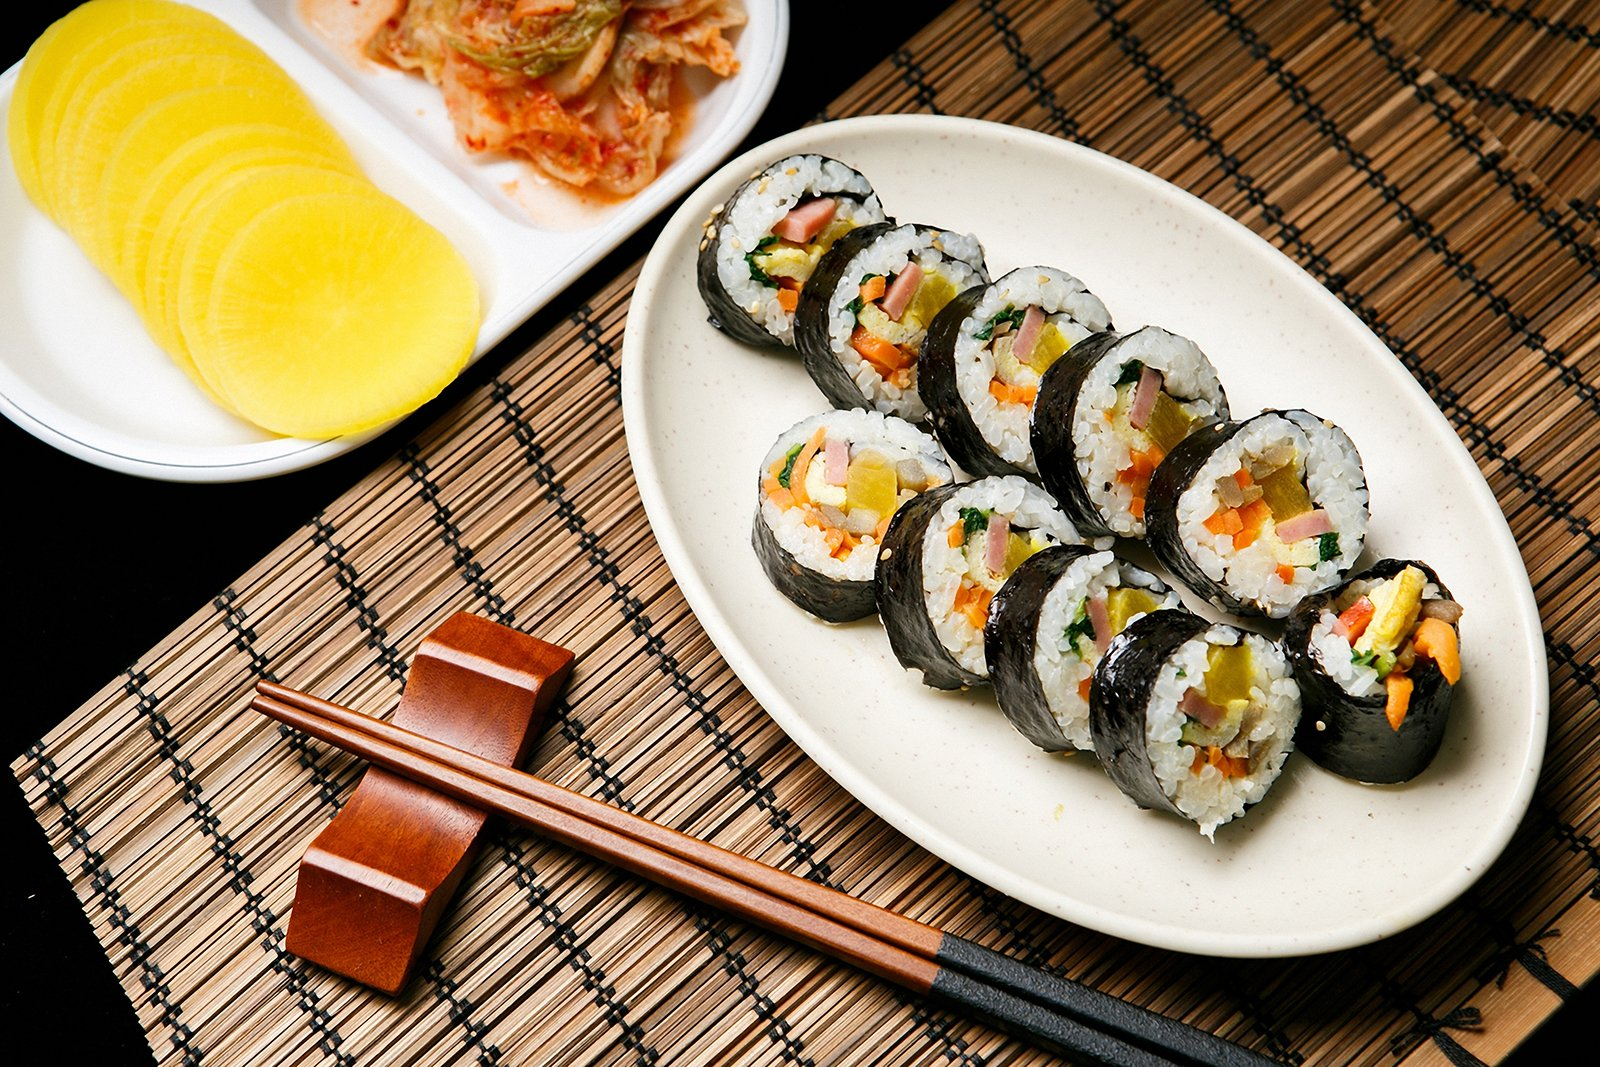 Gimbap – Seaweed rice rolls